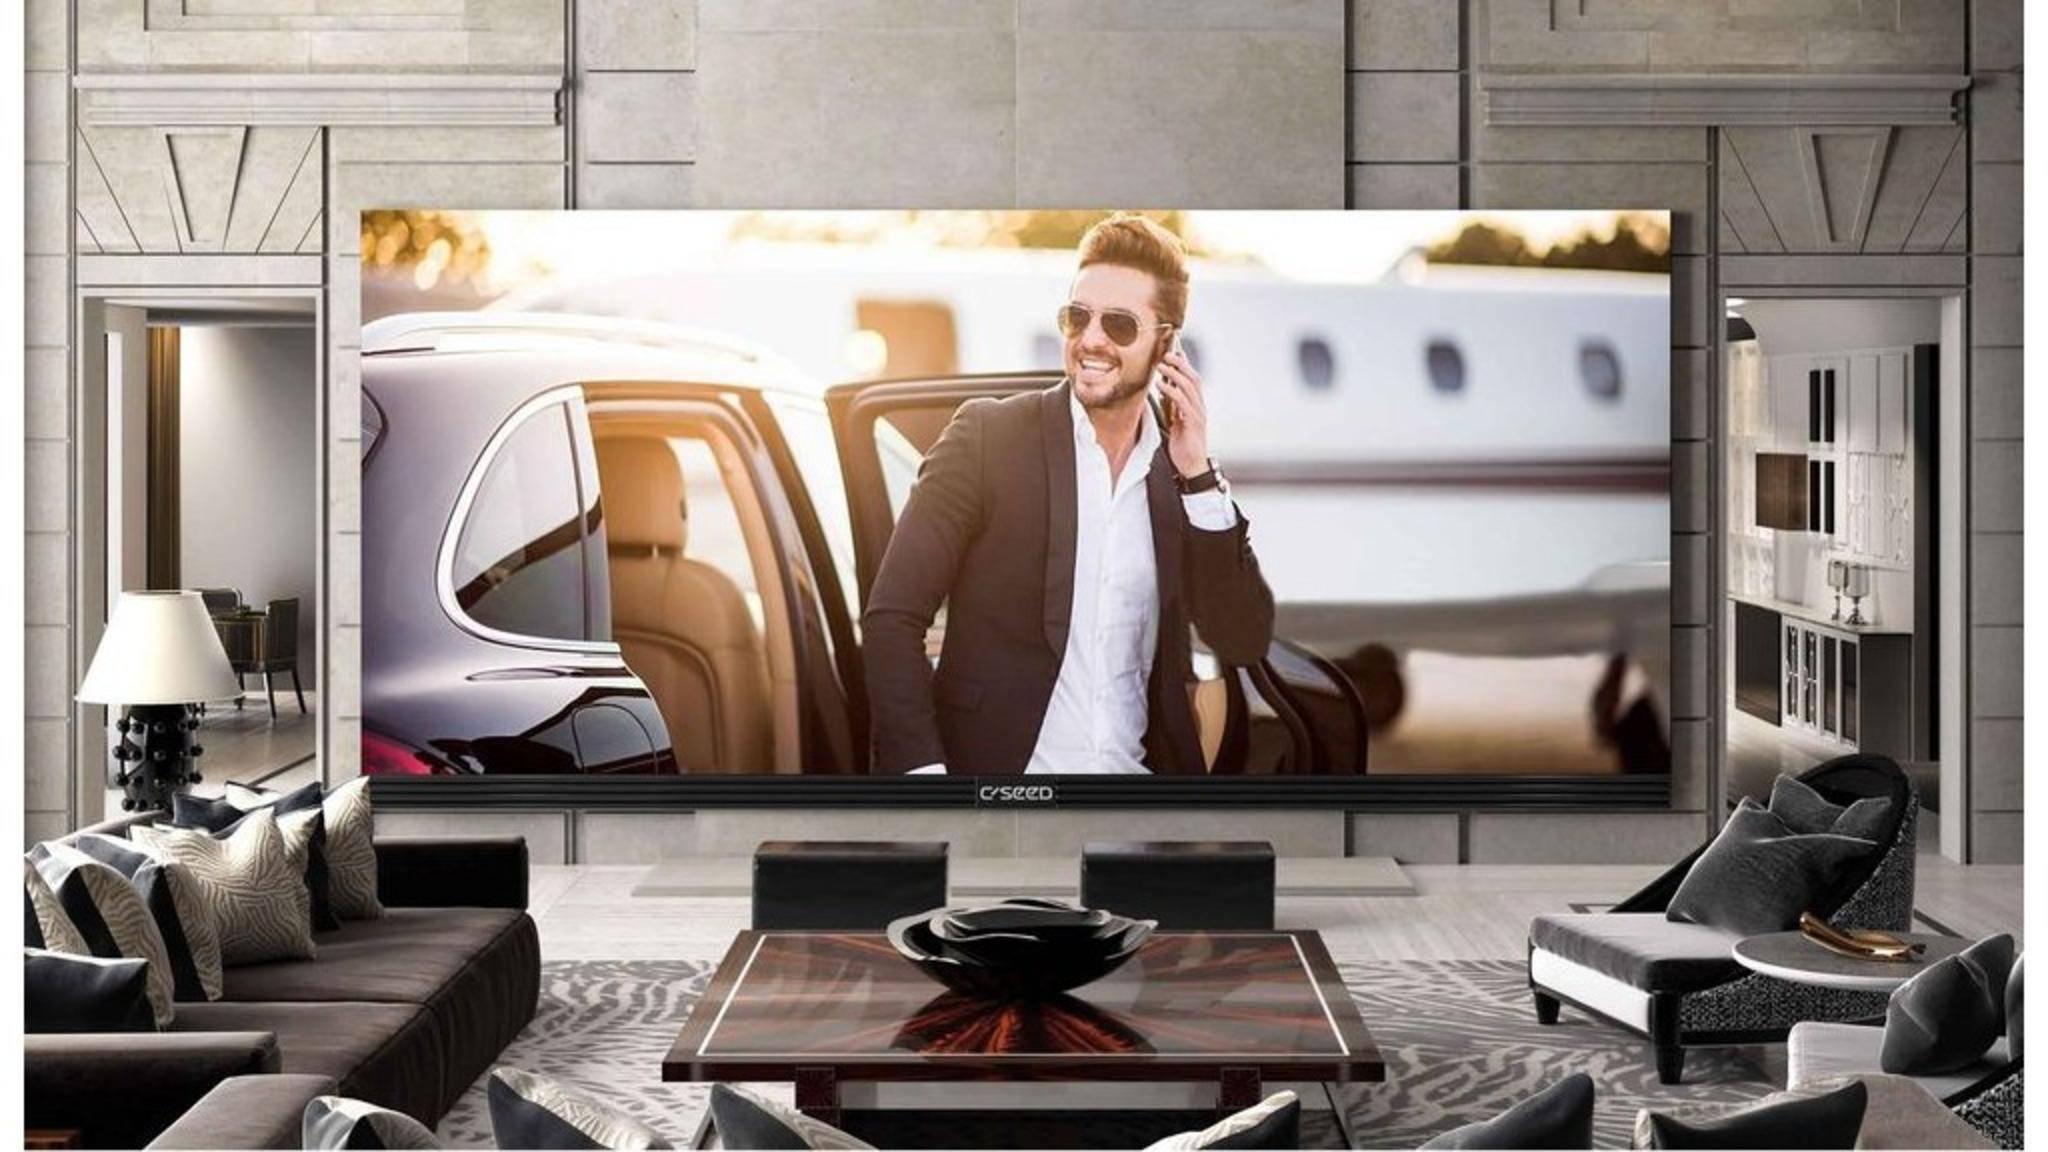 262 Zoll Diagonale, 800 Kilogramm schwer, 480.000 Euro teuer: Der 4K-TV C Seed 262 UHD.